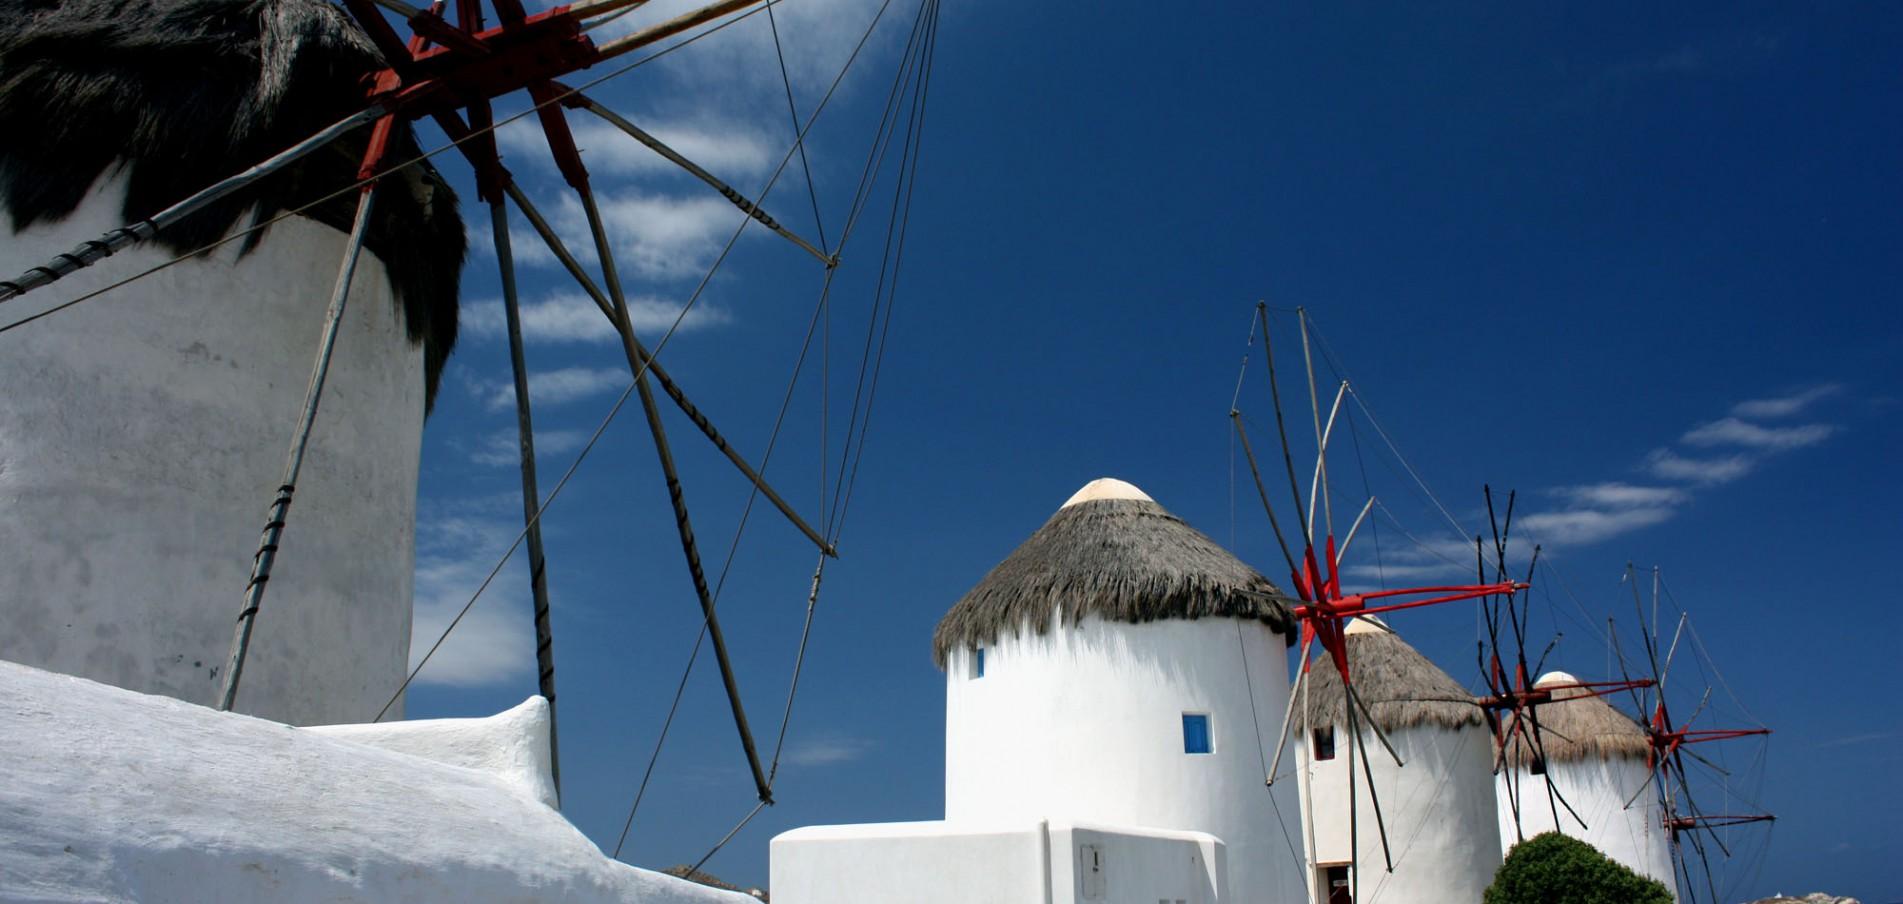 Willkommen auf Mykonos ... Inselfeeling deluxe!